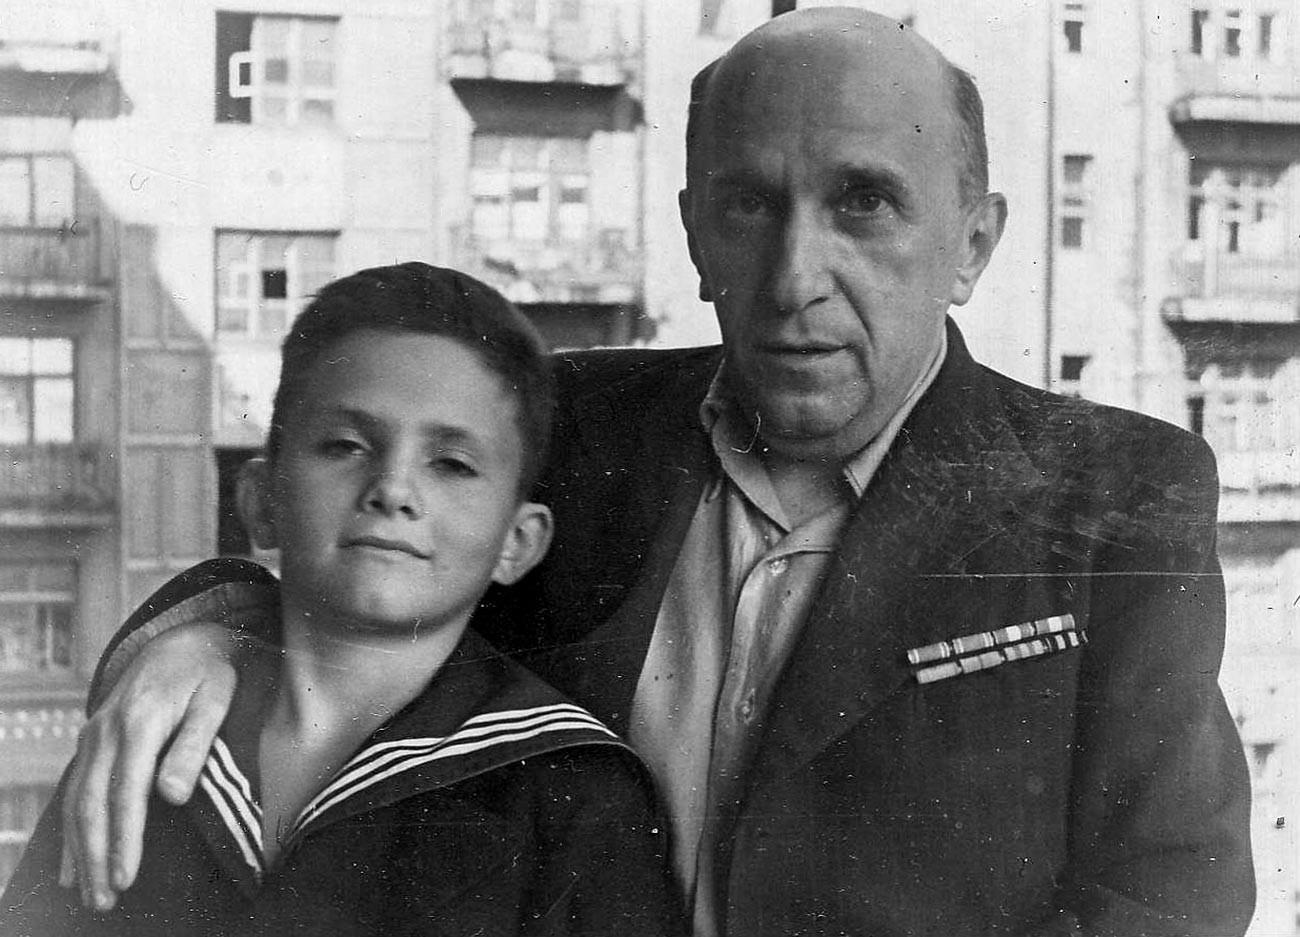 Jakow Serebrjanski mit seinem Sohn Anatoli